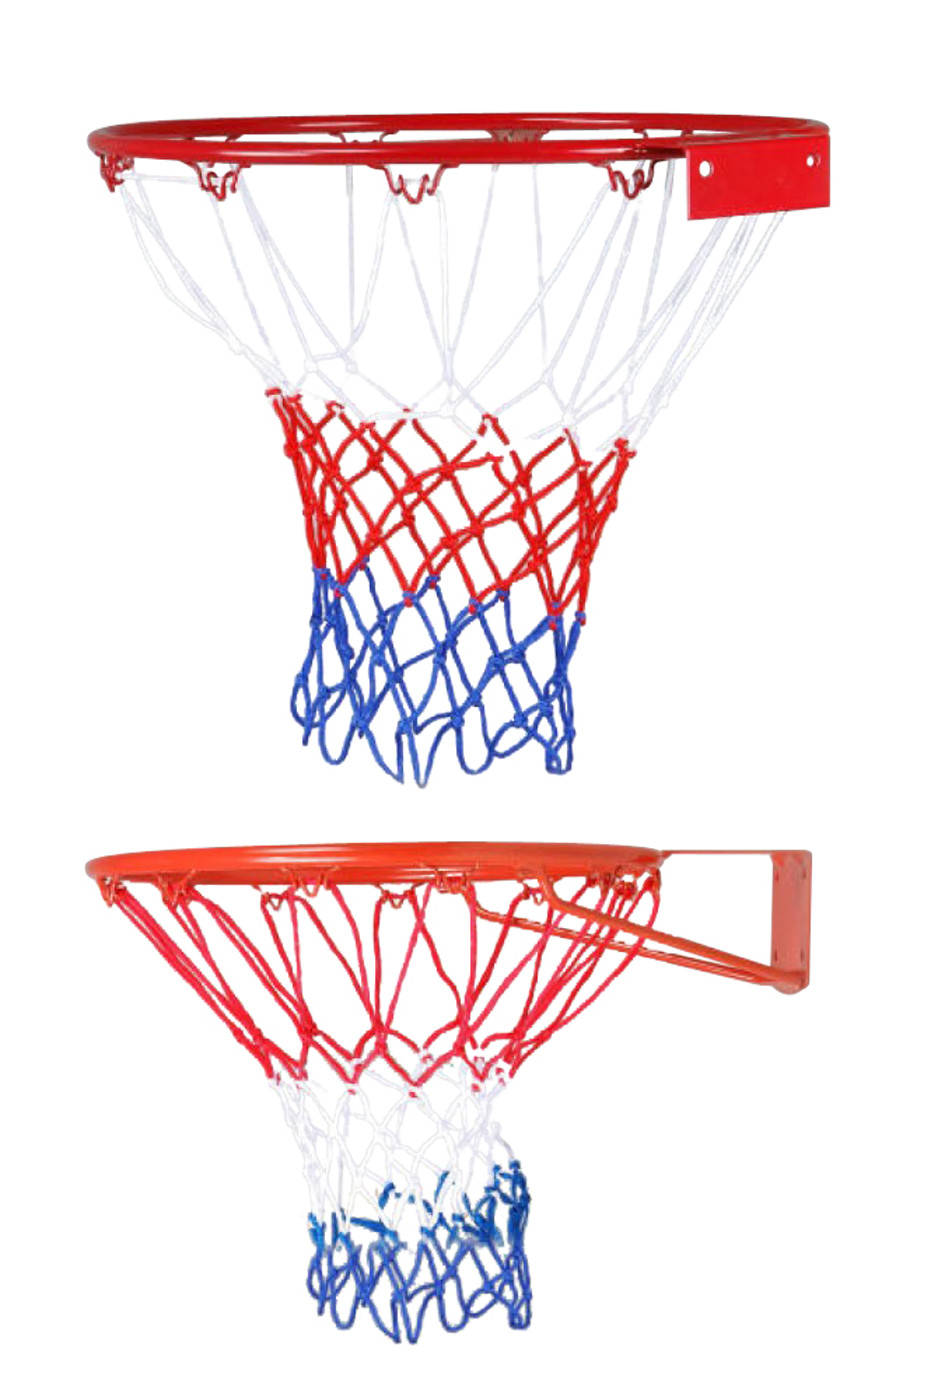 V3TEC Basket Netz + Ring 10mm/16mm